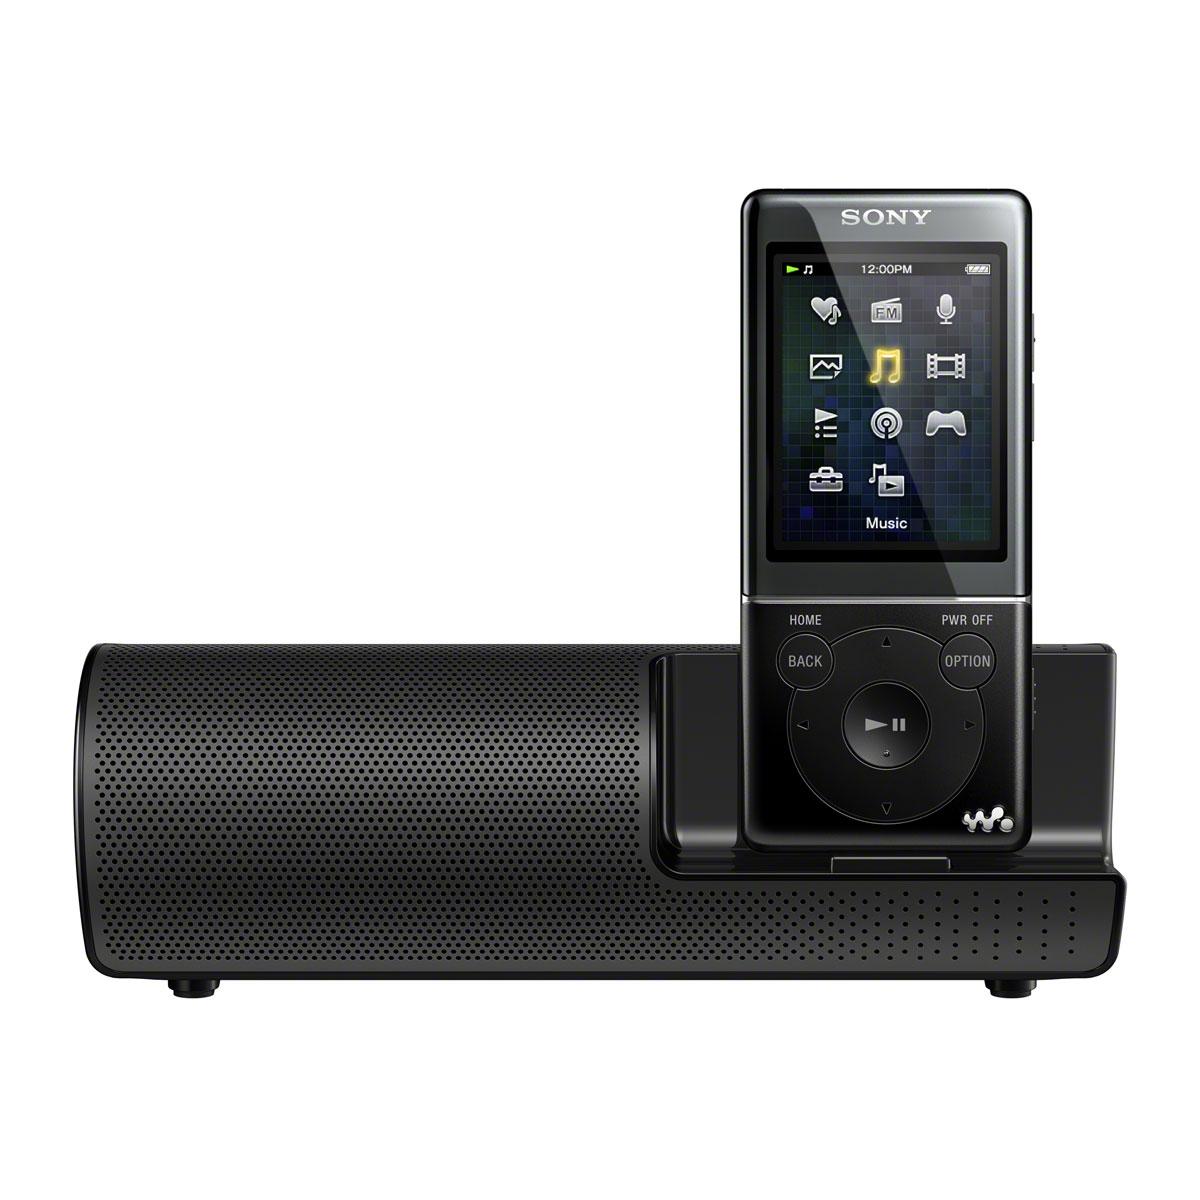 sony nwz e473k lecteur mp3 ipod sony sur. Black Bedroom Furniture Sets. Home Design Ideas